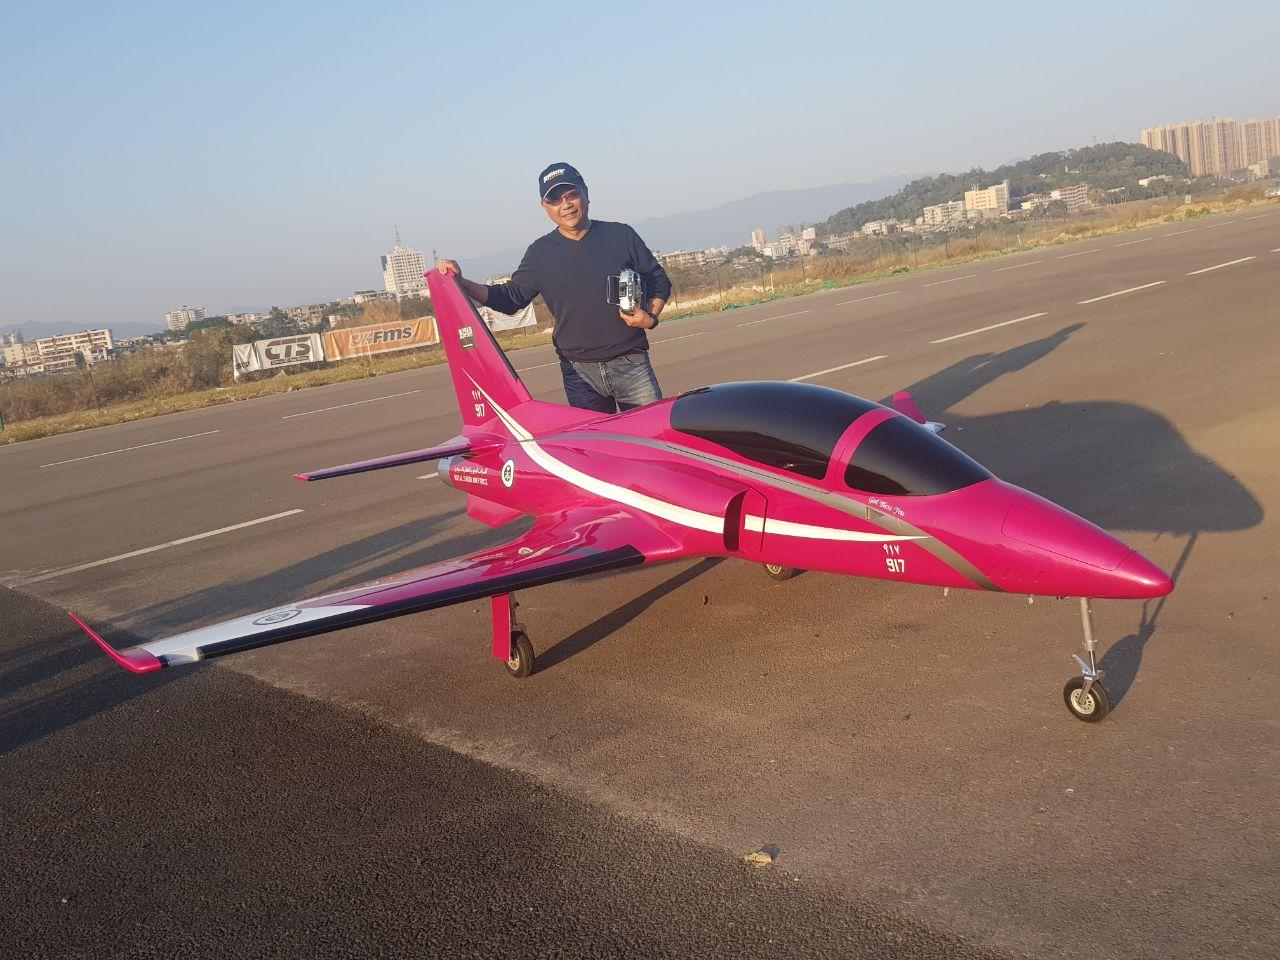 Skymaster Viper Jet XXL instruction manual